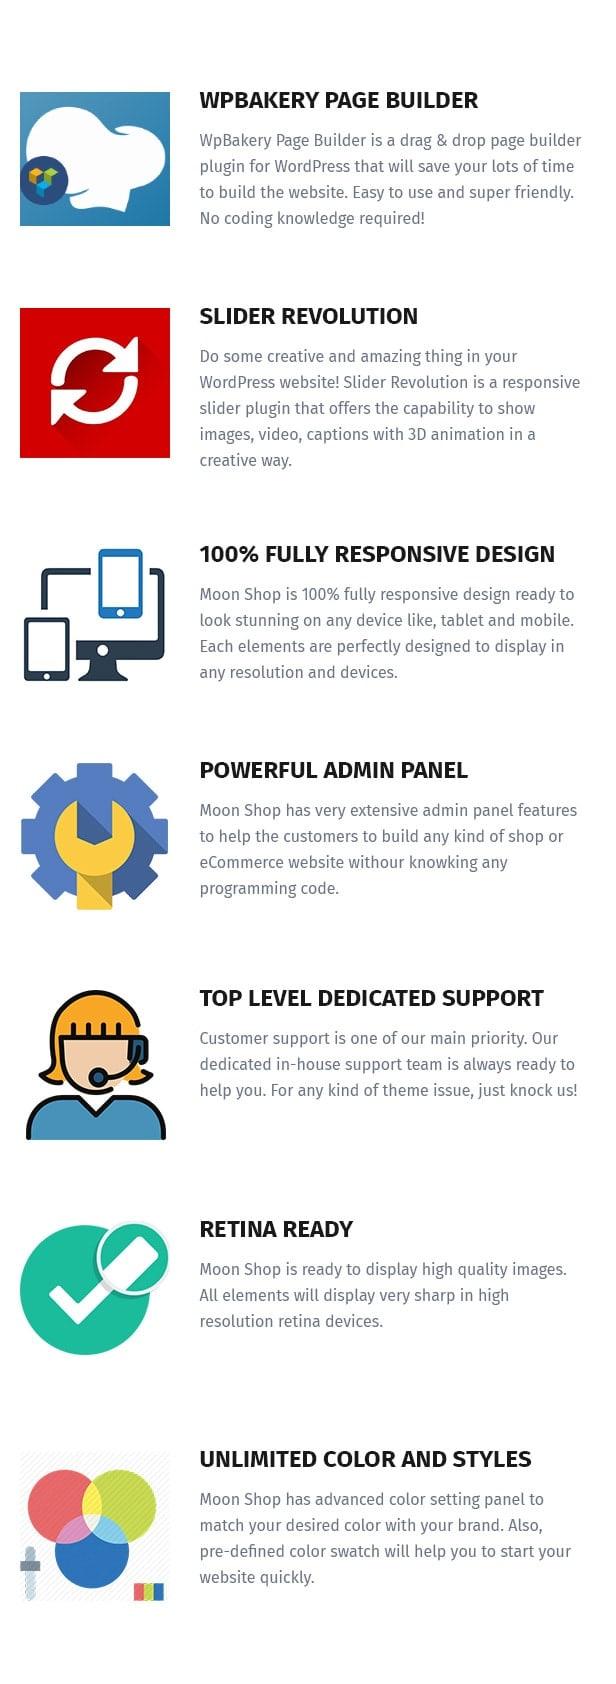 Moon Shop - Responsive eCommerce WordPress Theme for WooCommerce - 12